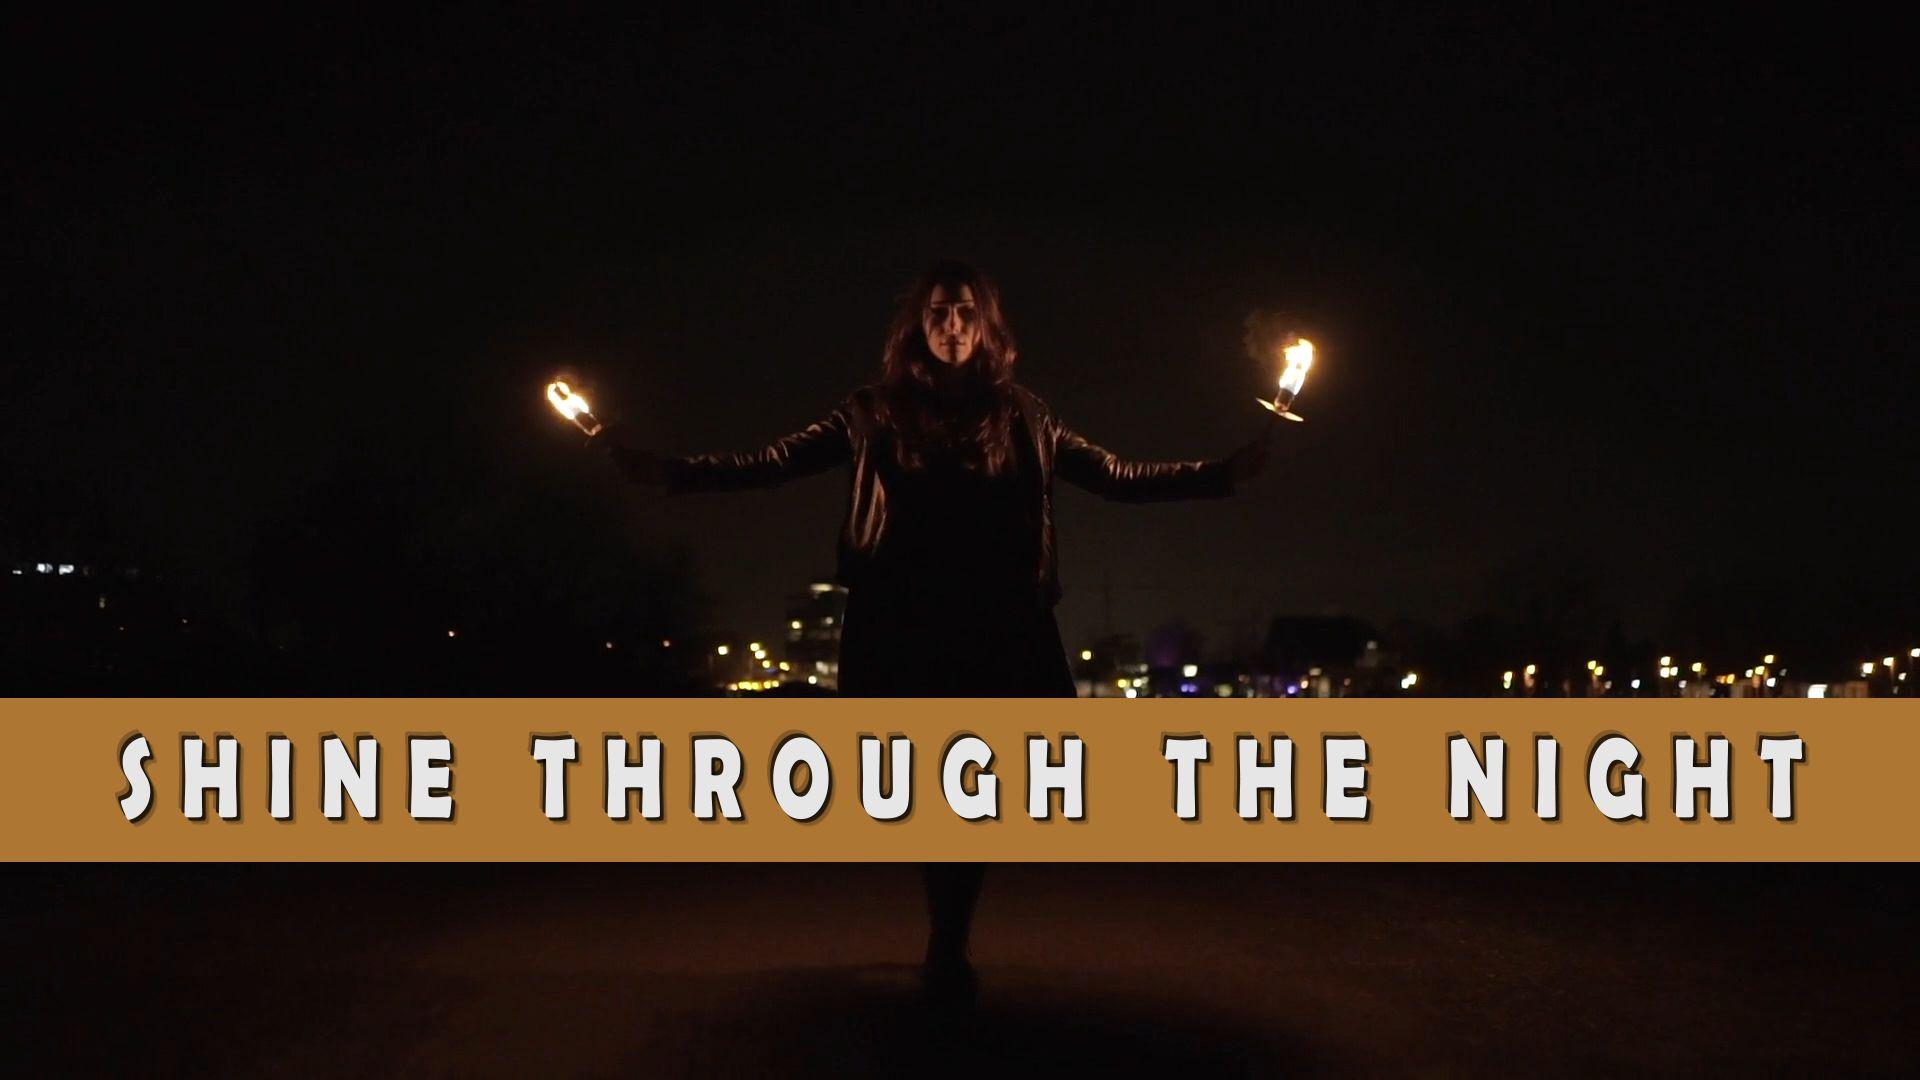 SHINE THROUGH THE NIGHT (original mix)